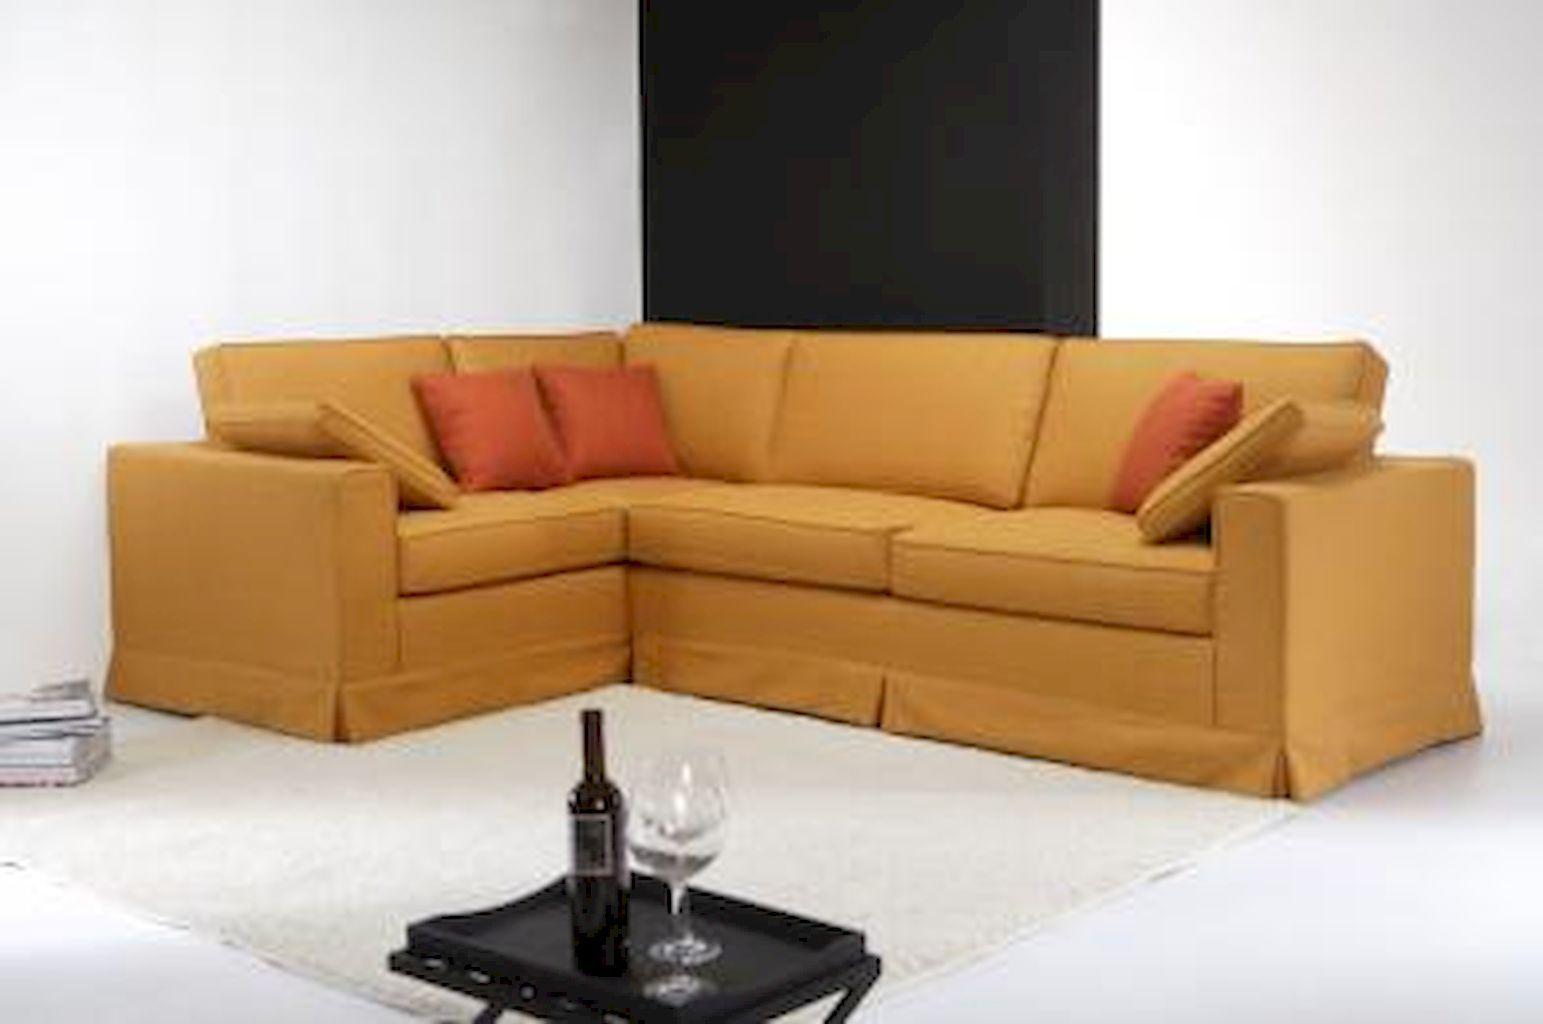 Peachy 50 Simple Small Apartment Size Recliners Ideas On A Budget Creativecarmelina Interior Chair Design Creativecarmelinacom